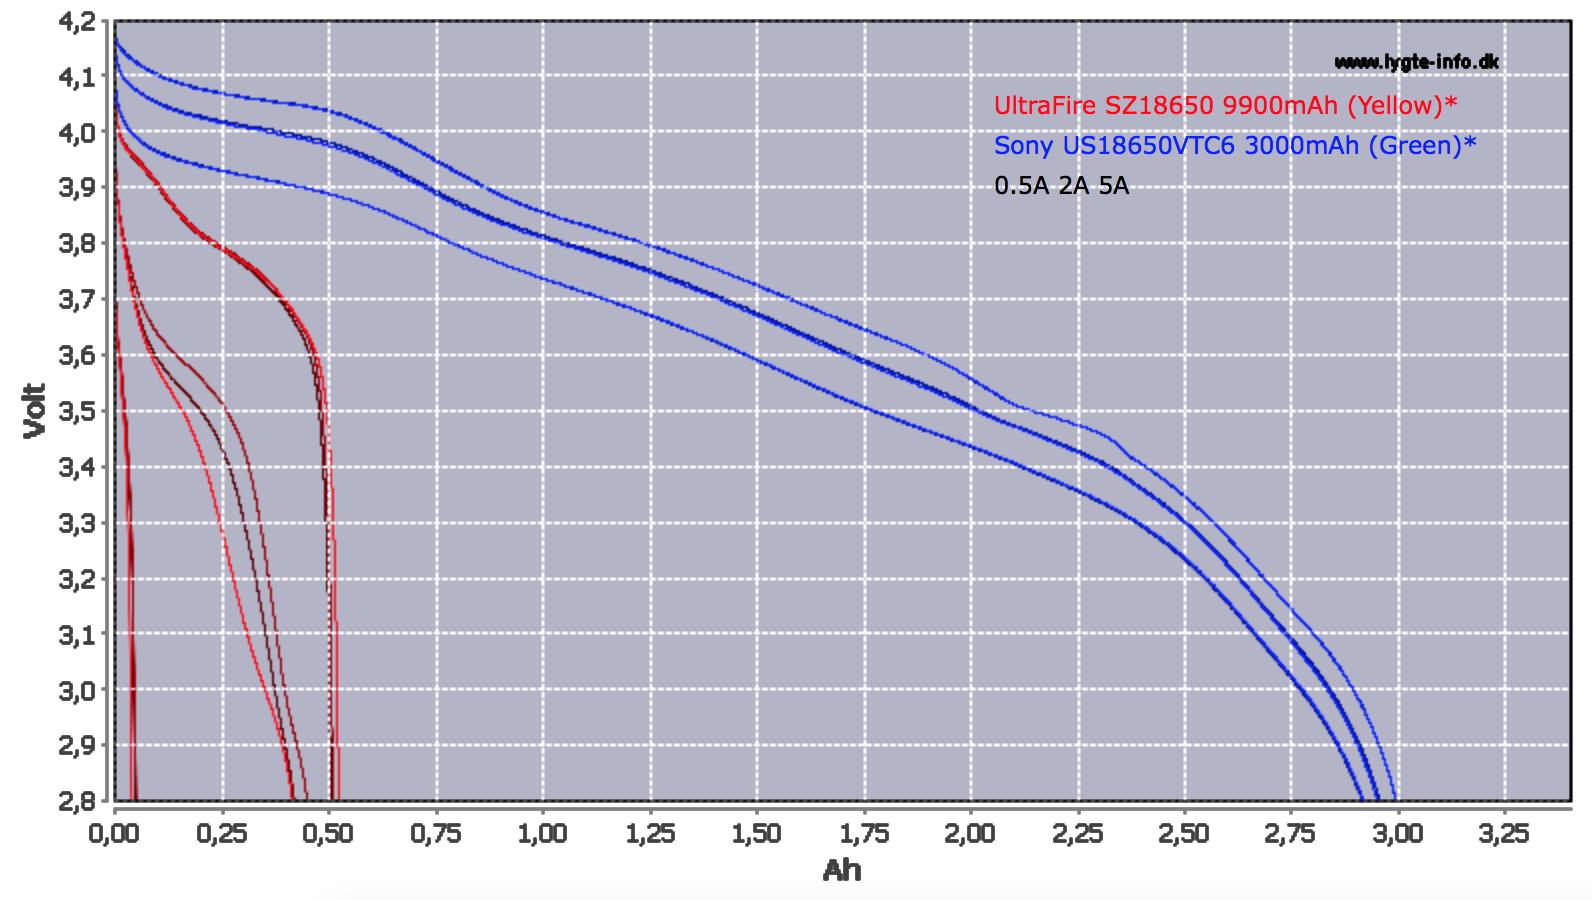 Sony VTC6 3000mAh vs Ultrasfire 9900mAh